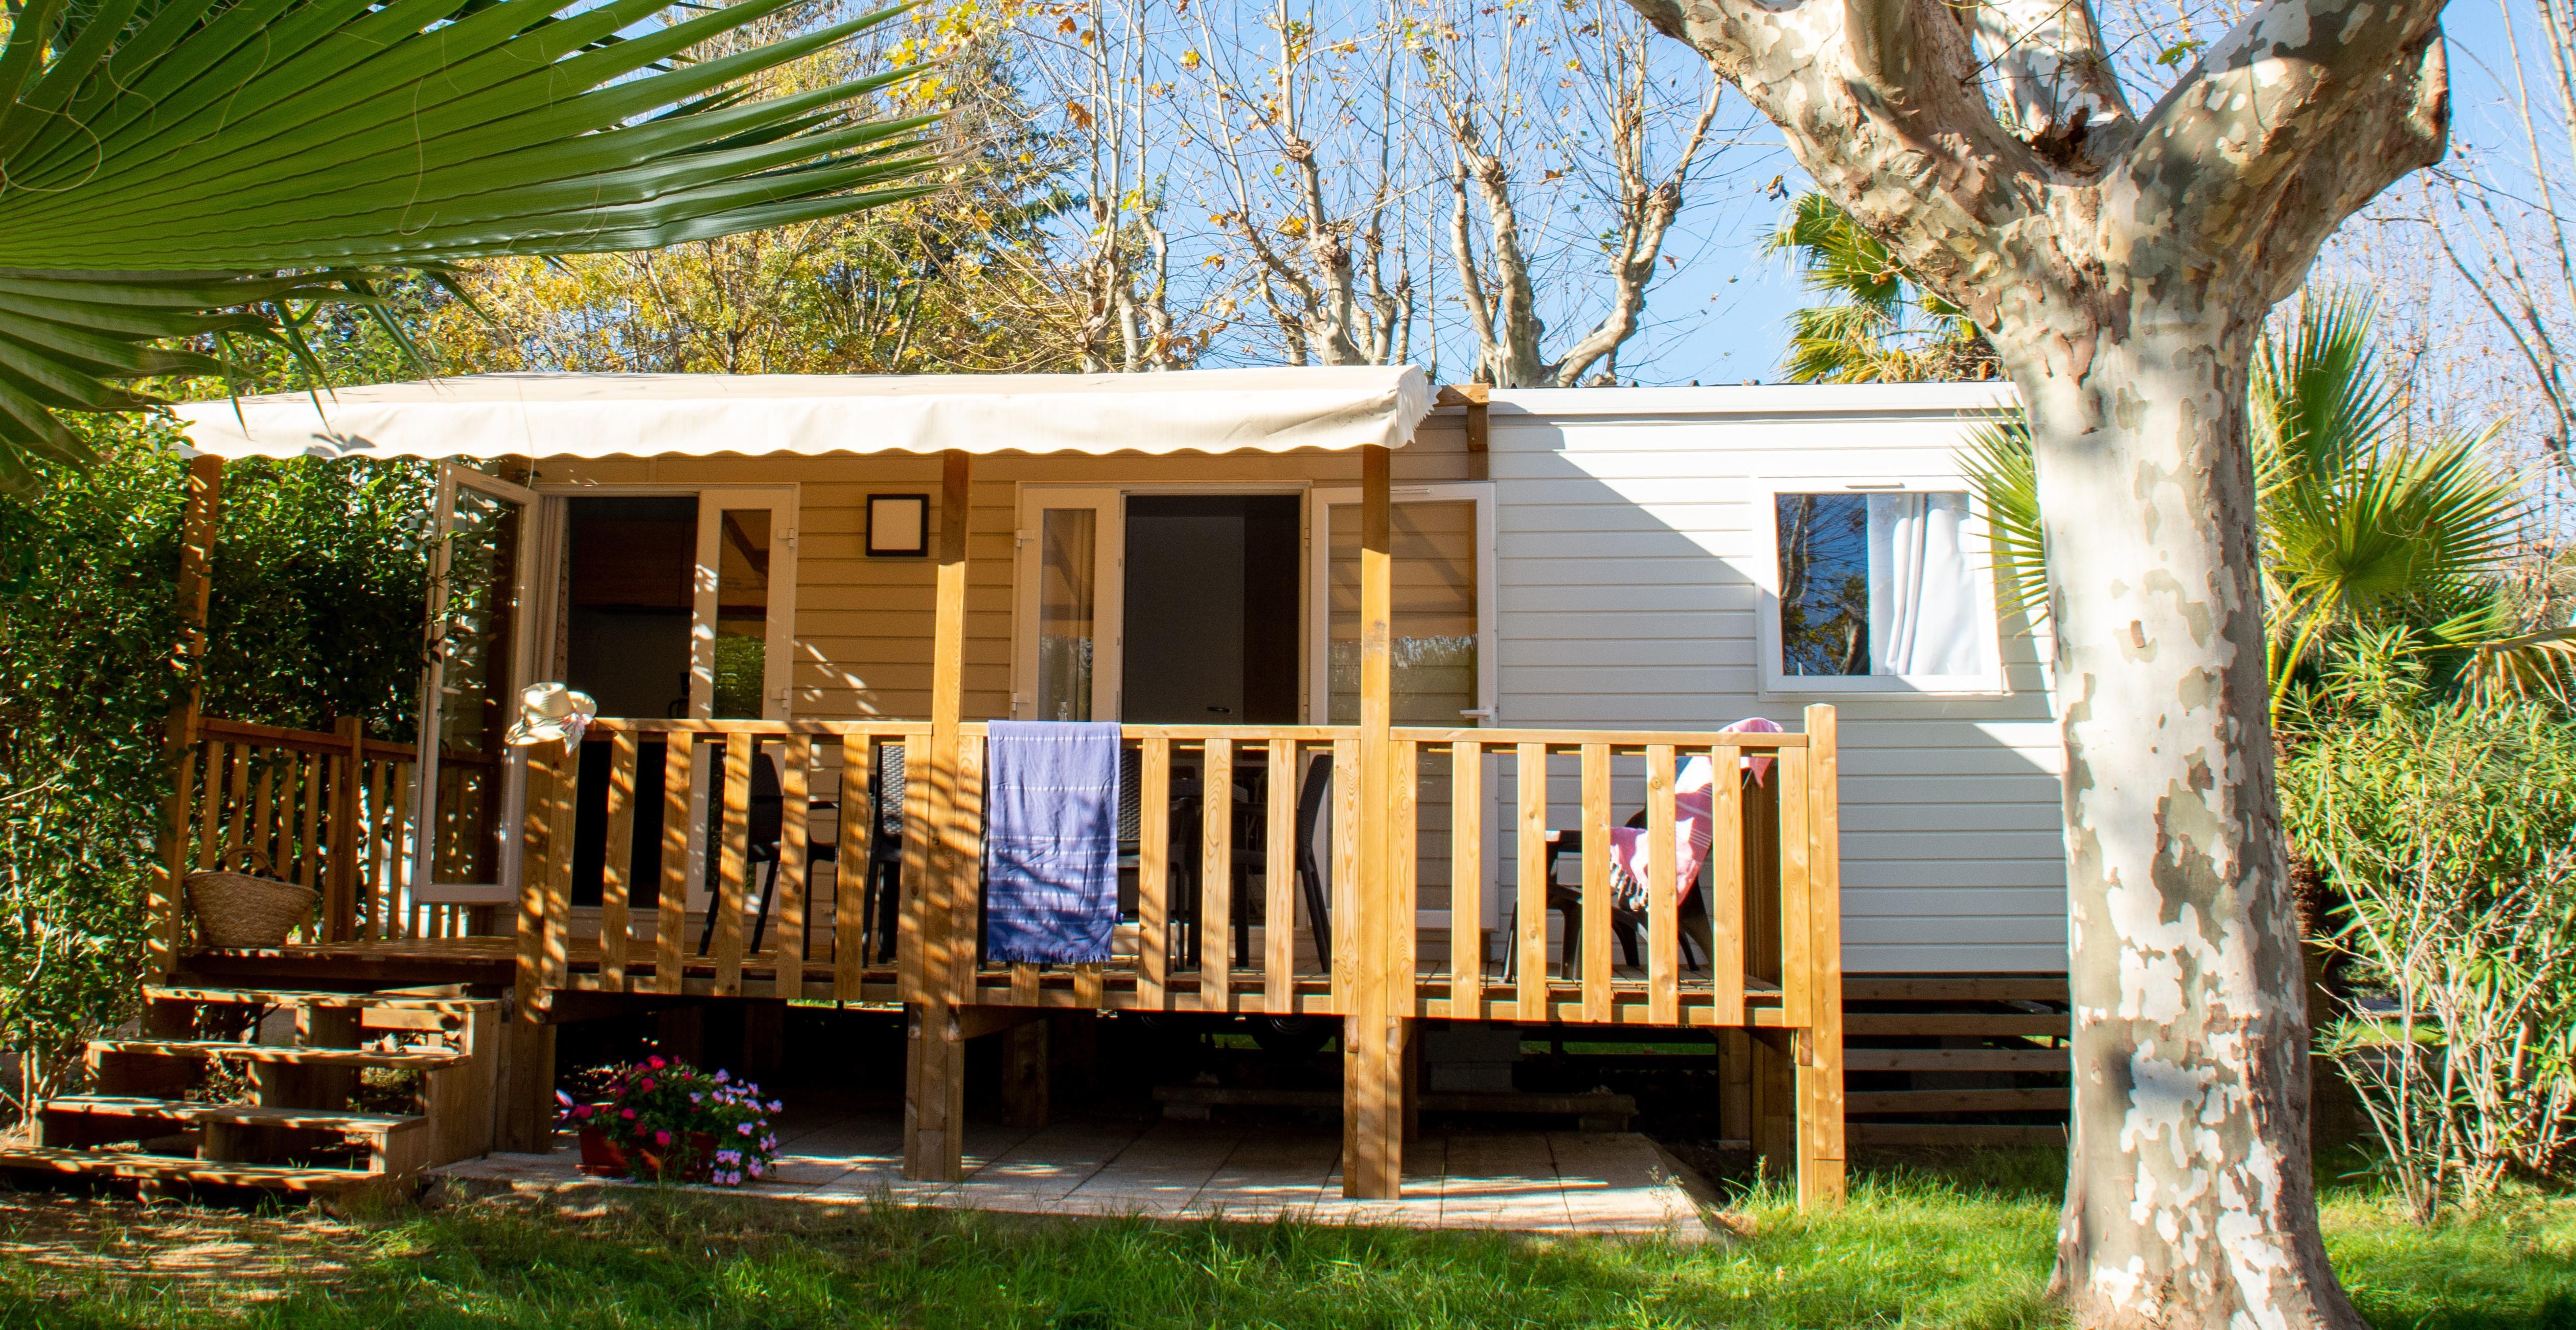 Location - Mobil Home Cosy 32M² /2 Chambres - Terrasse En Bois + Climatisation / Lave Vaisselle 2021 - Camping Les Pêcheurs